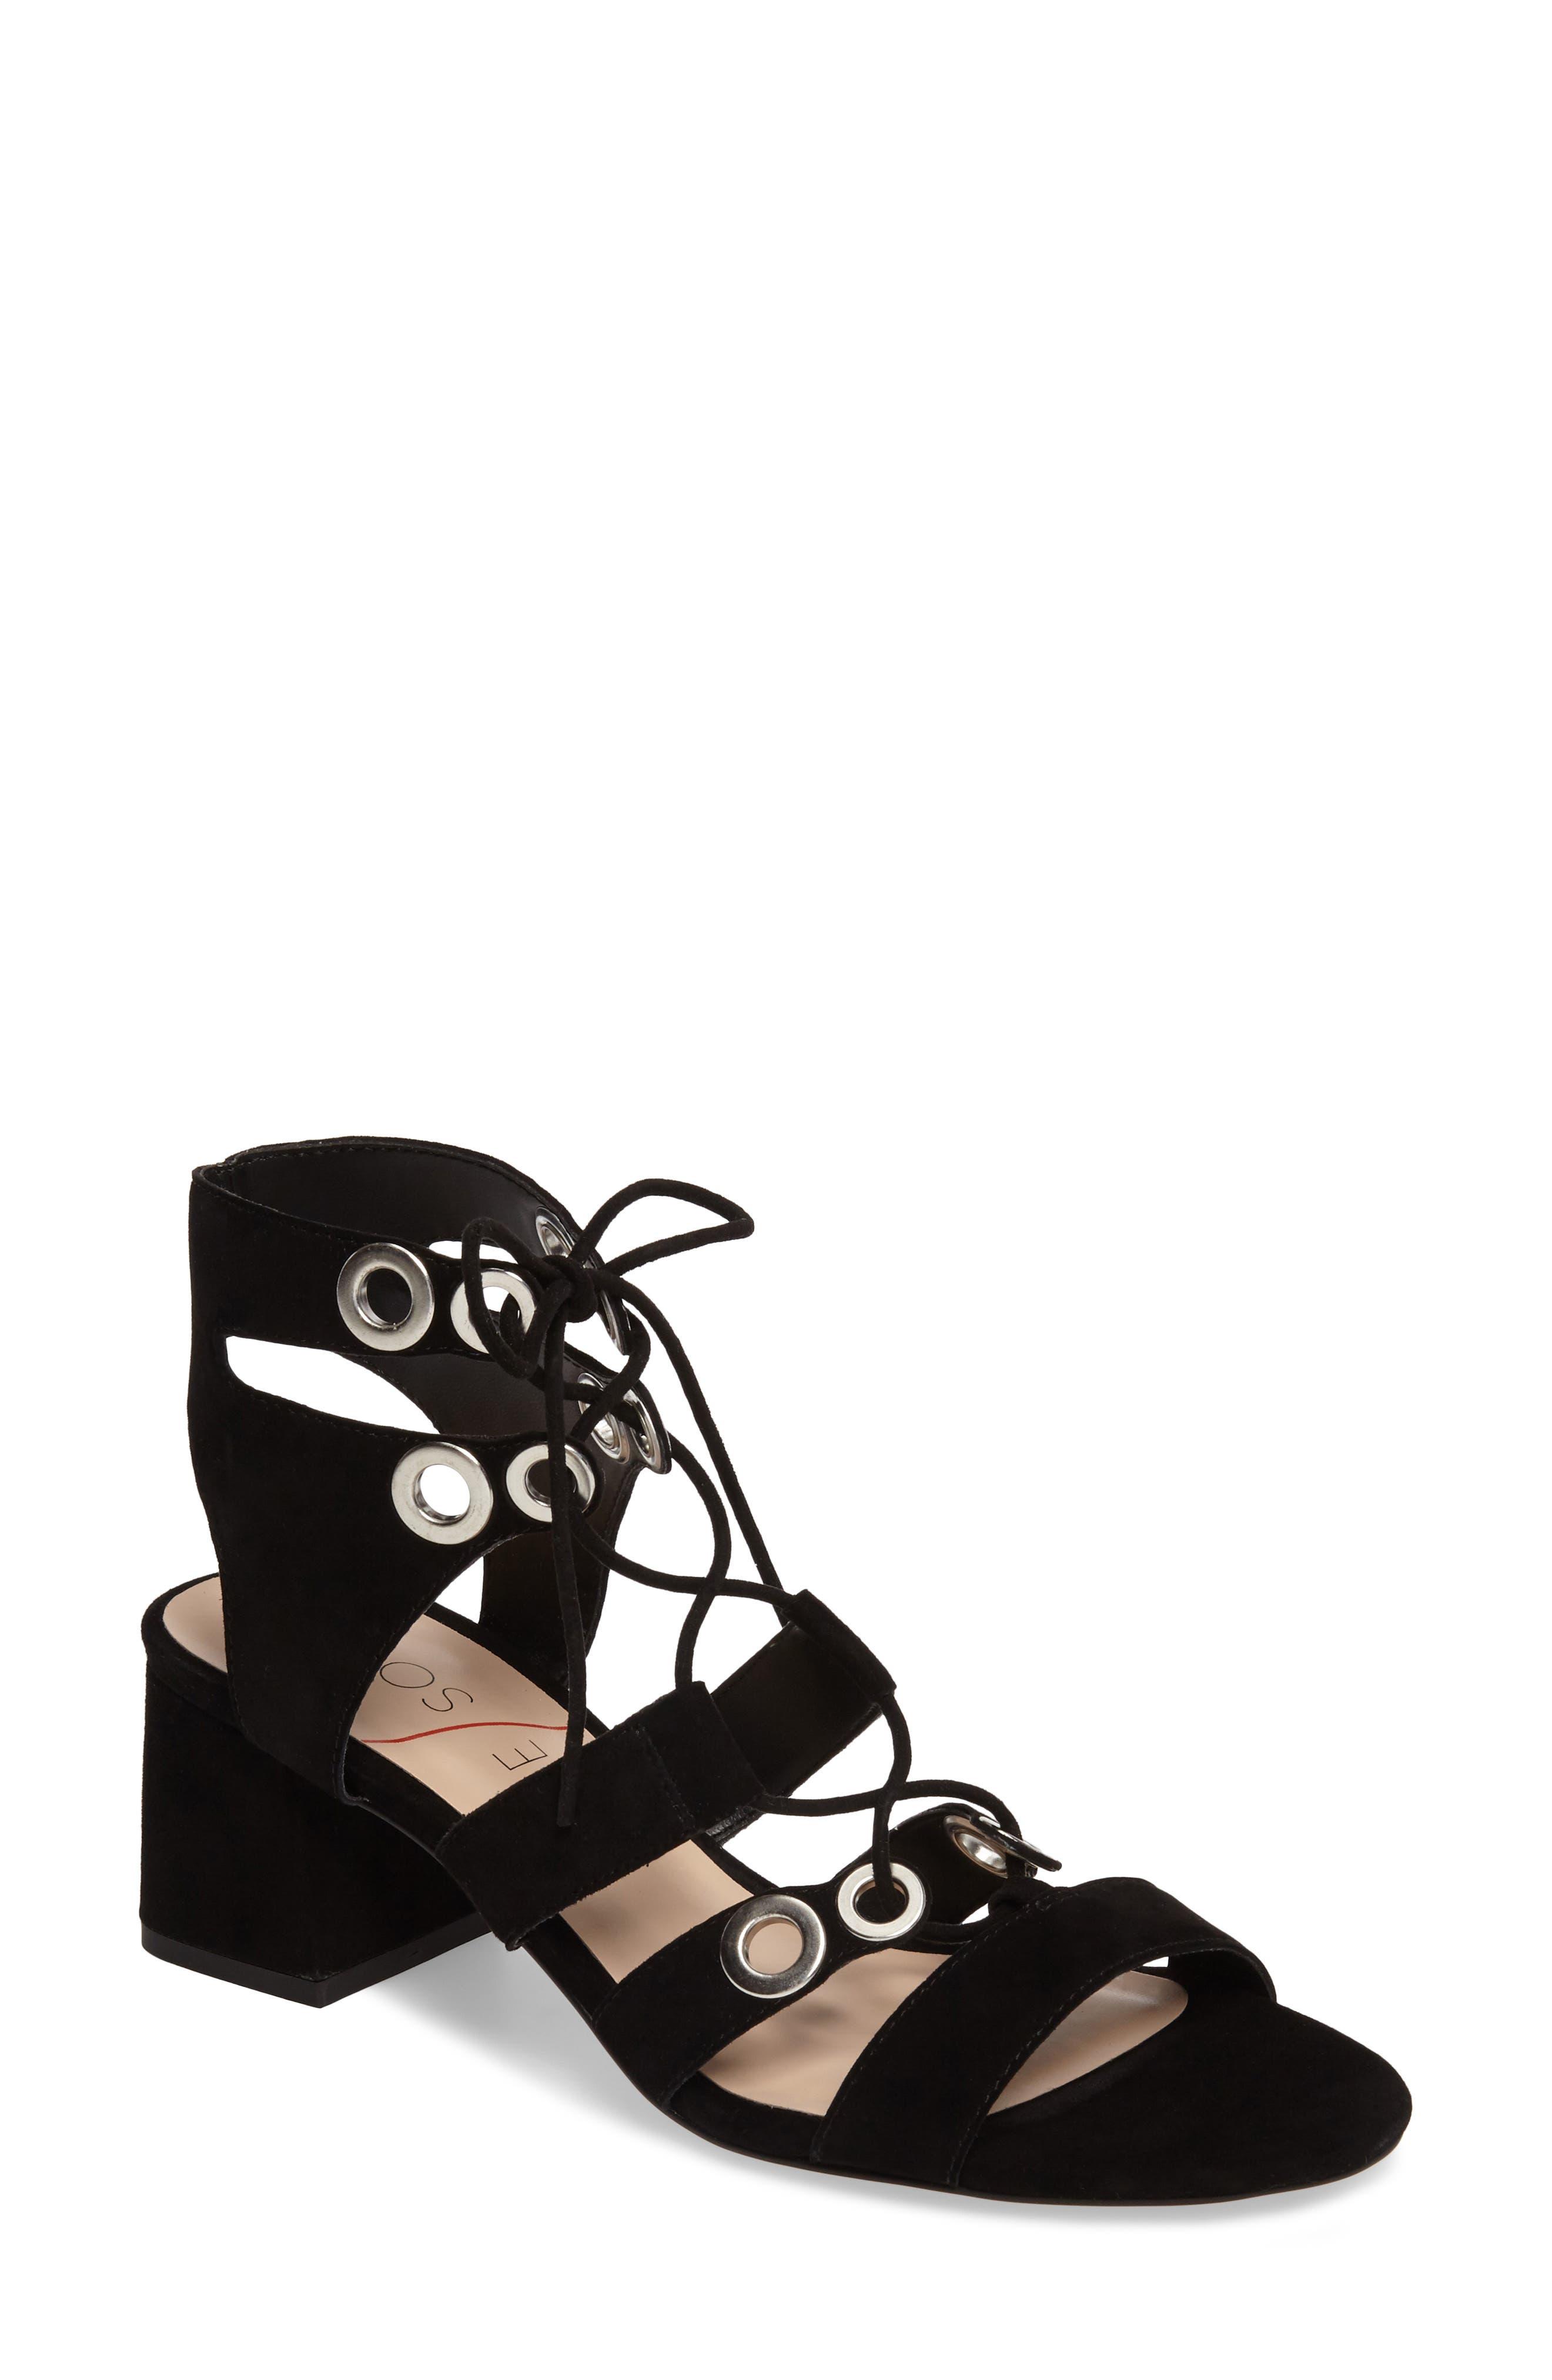 FOOTWEAR - Lace-up shoes Les Trois Gar?ons Ja2yuEnw